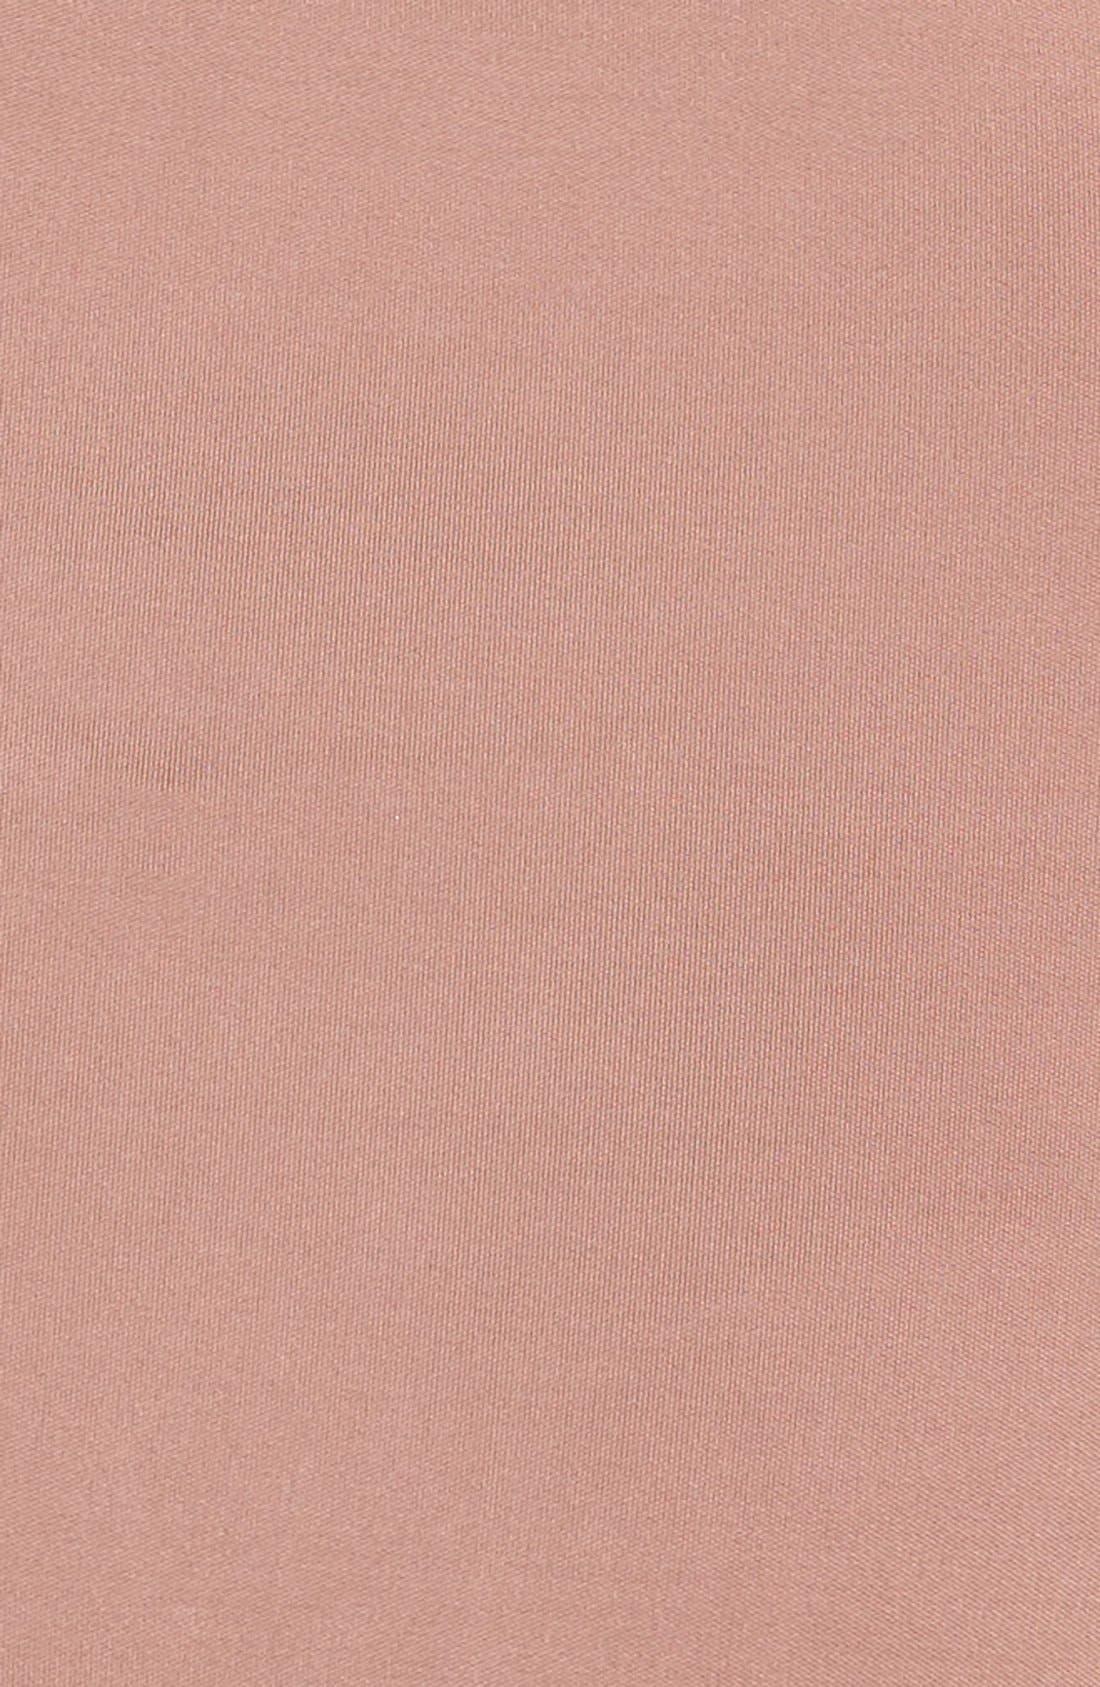 One-Shoulder Twist Gown,                             Alternate thumbnail 6, color,                             DUNE